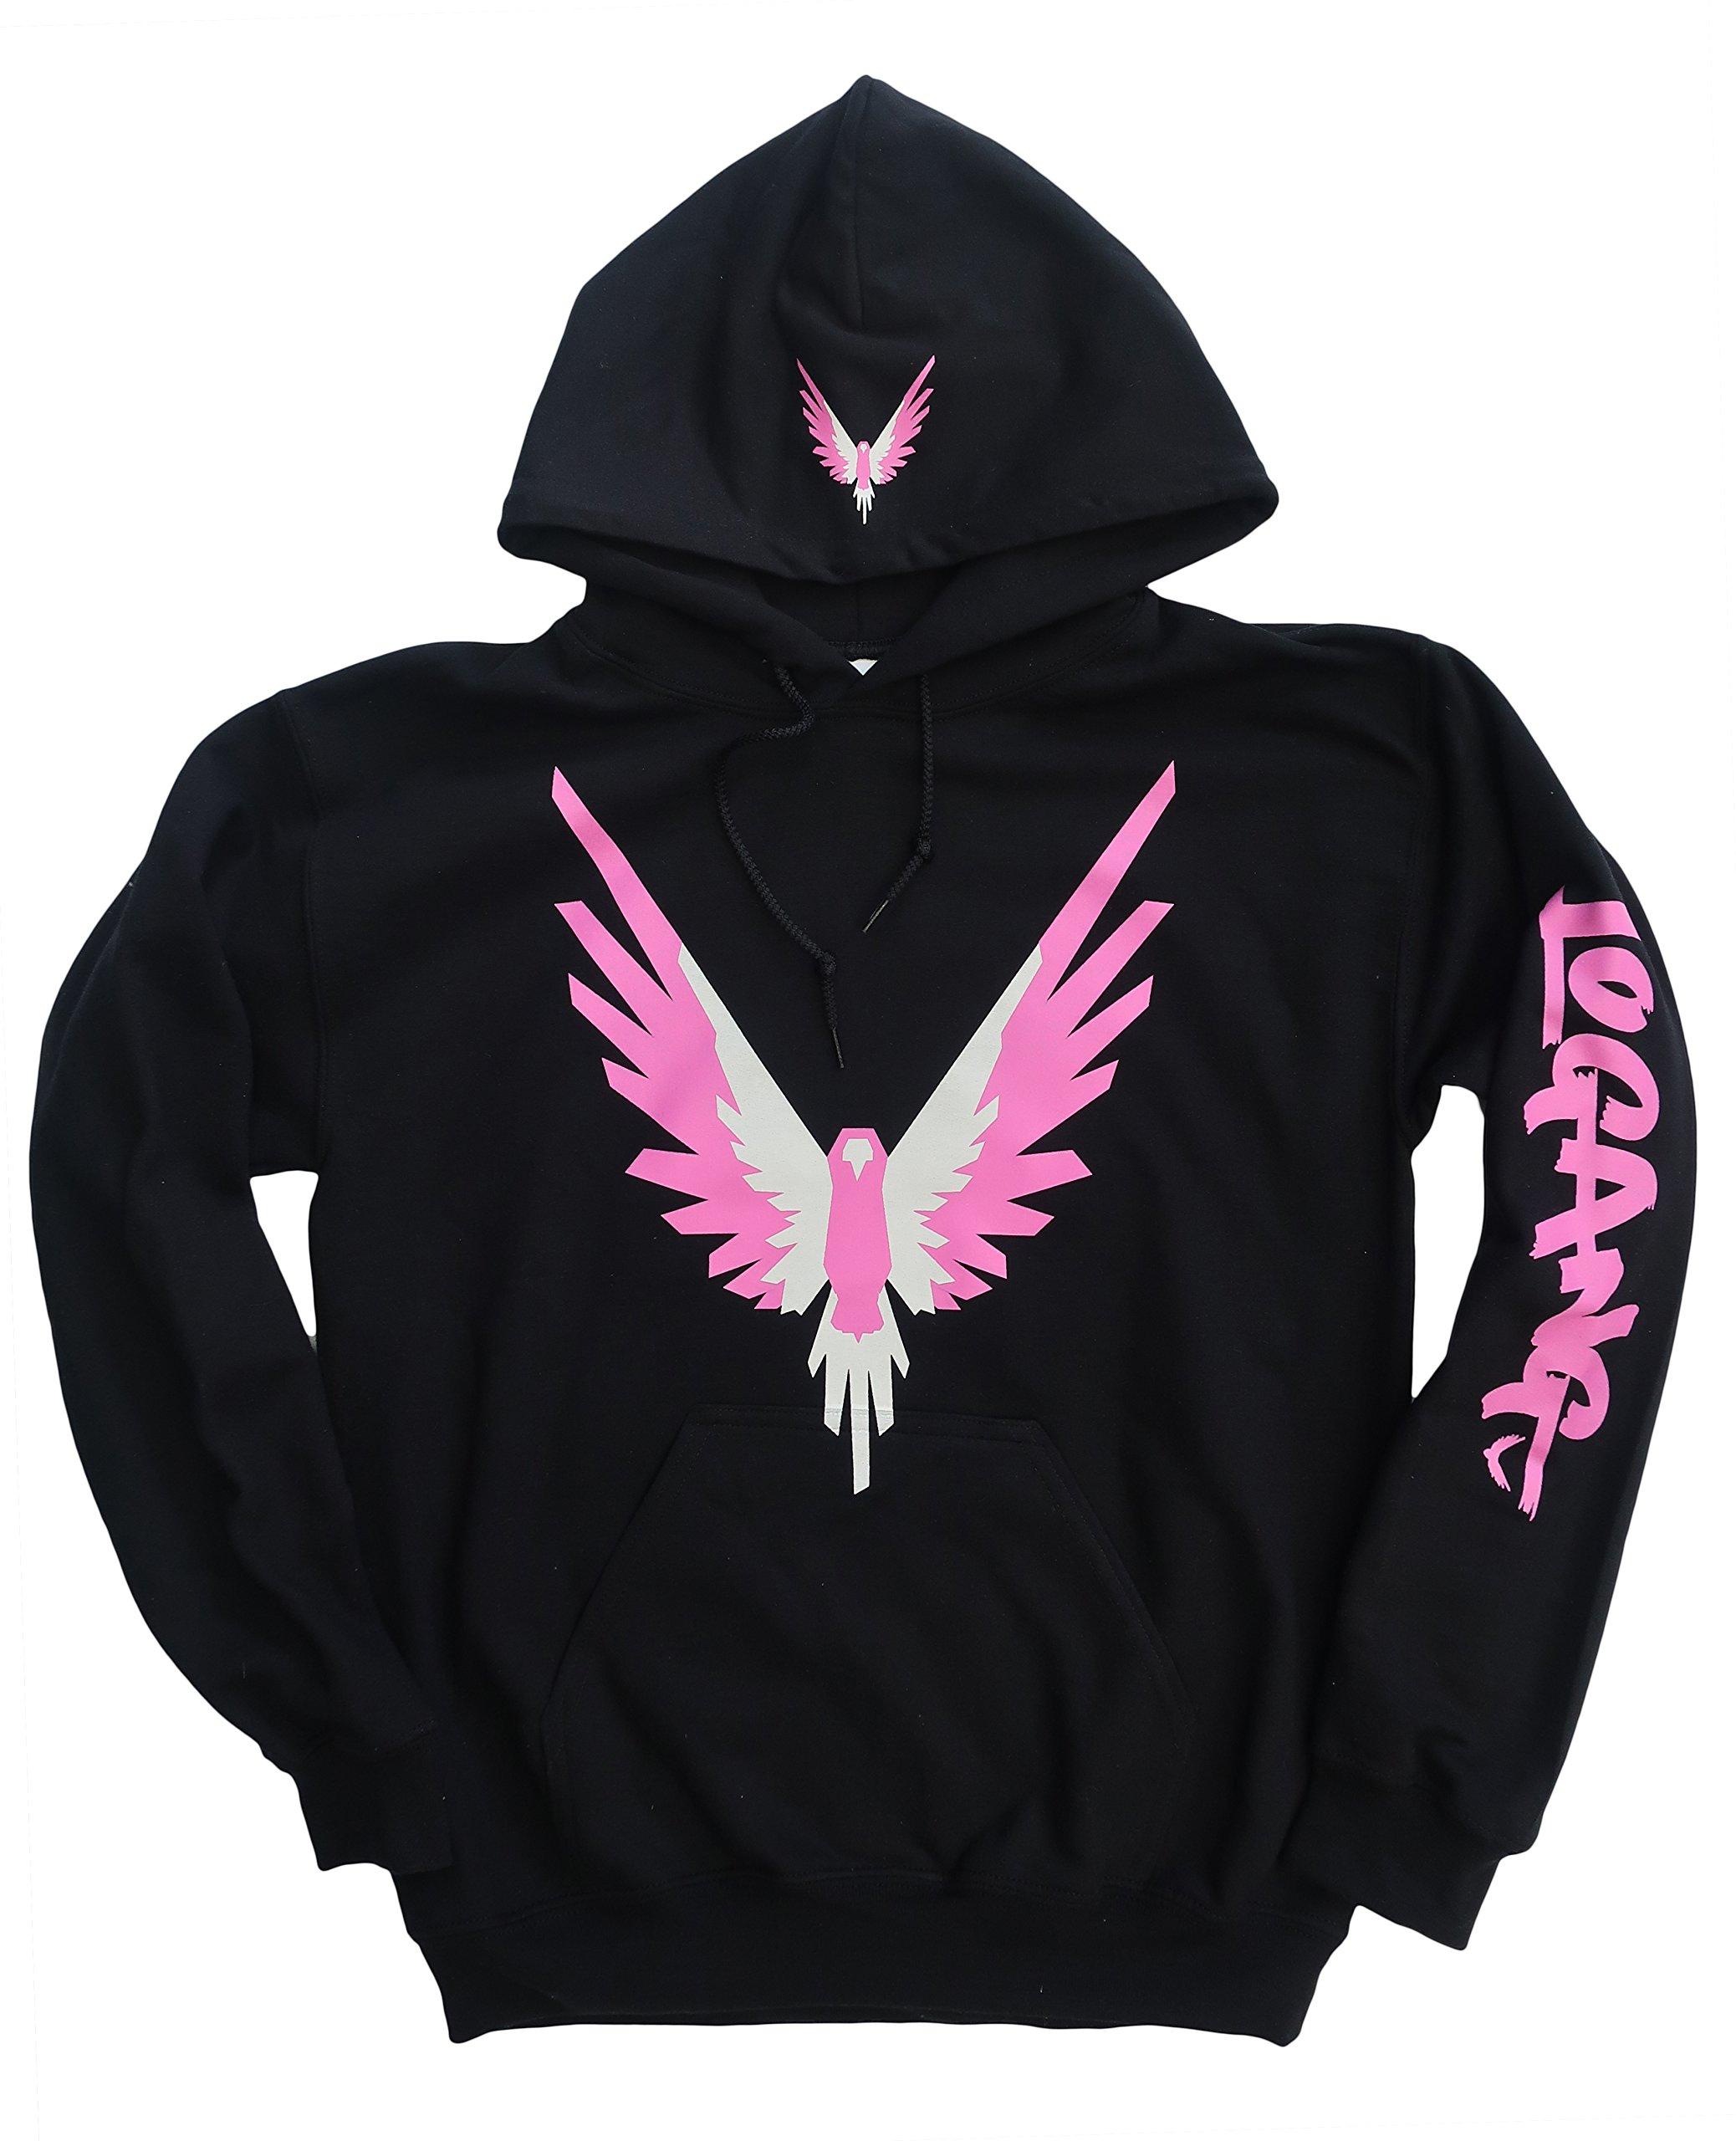 b795baeb0acf4 Logang Logan Paul Maverick Adult Black Hoodie (Pink and White Bird Logo)